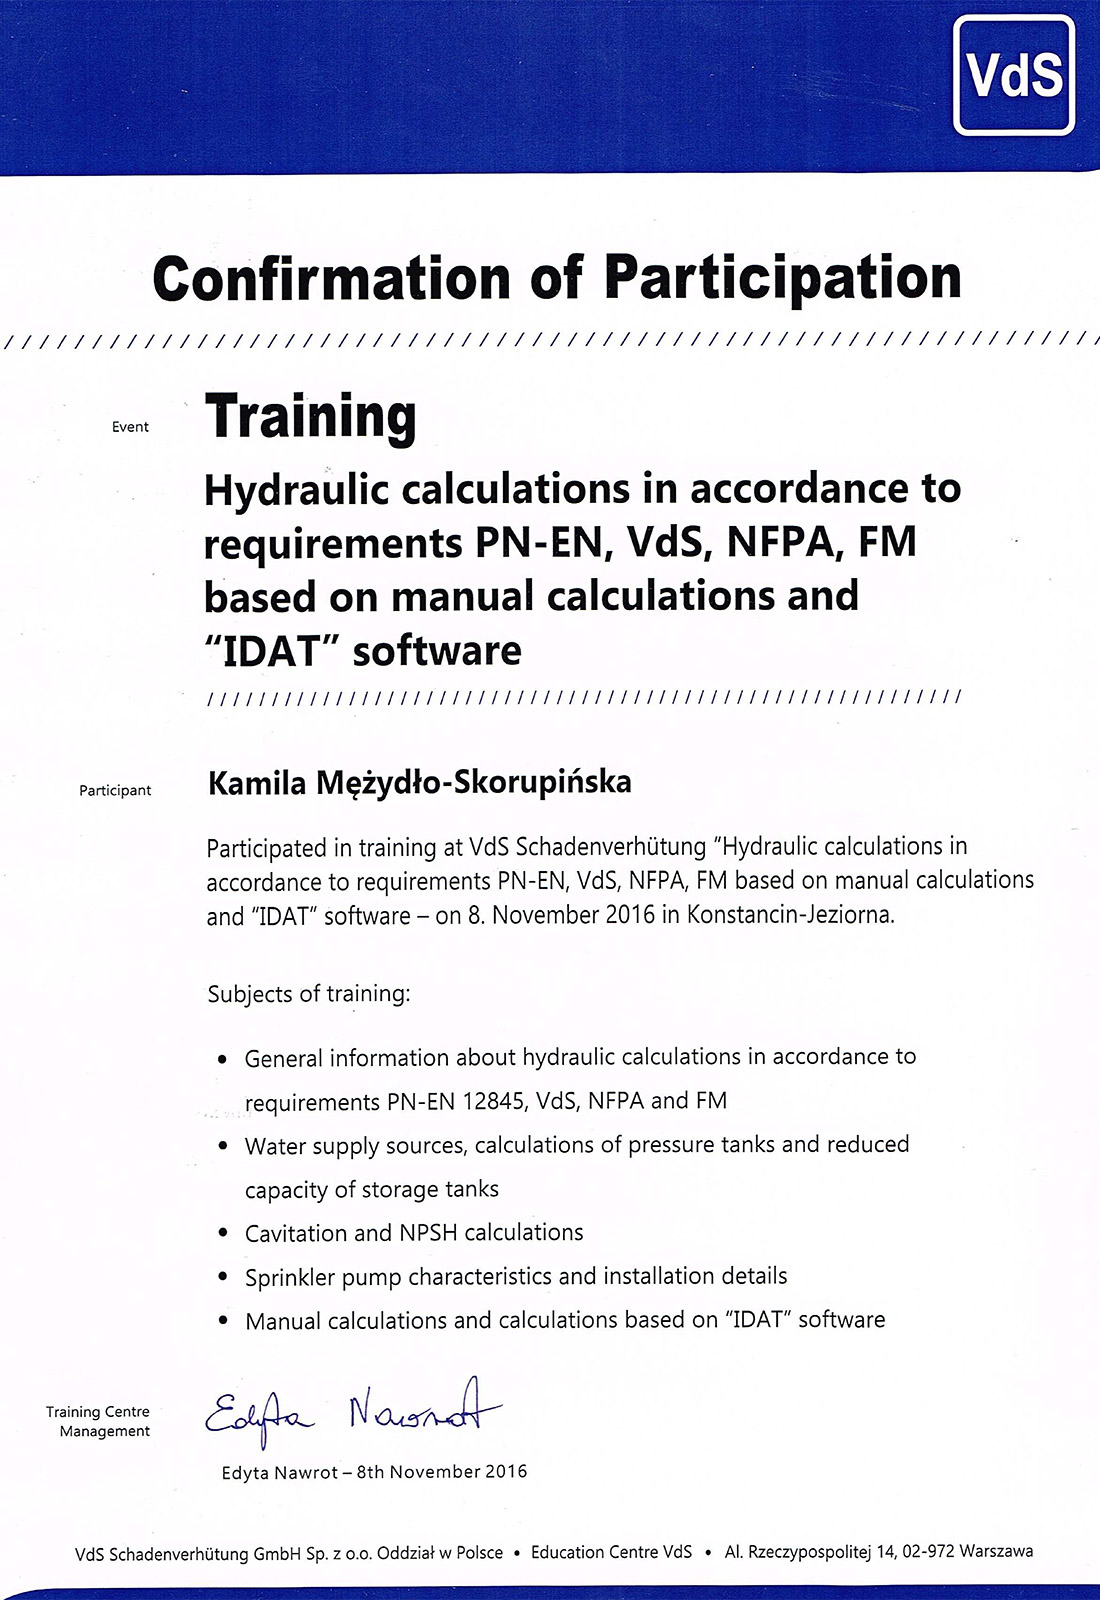 certyfikat_2016_obliczenia-hydrauliczne_kms_en